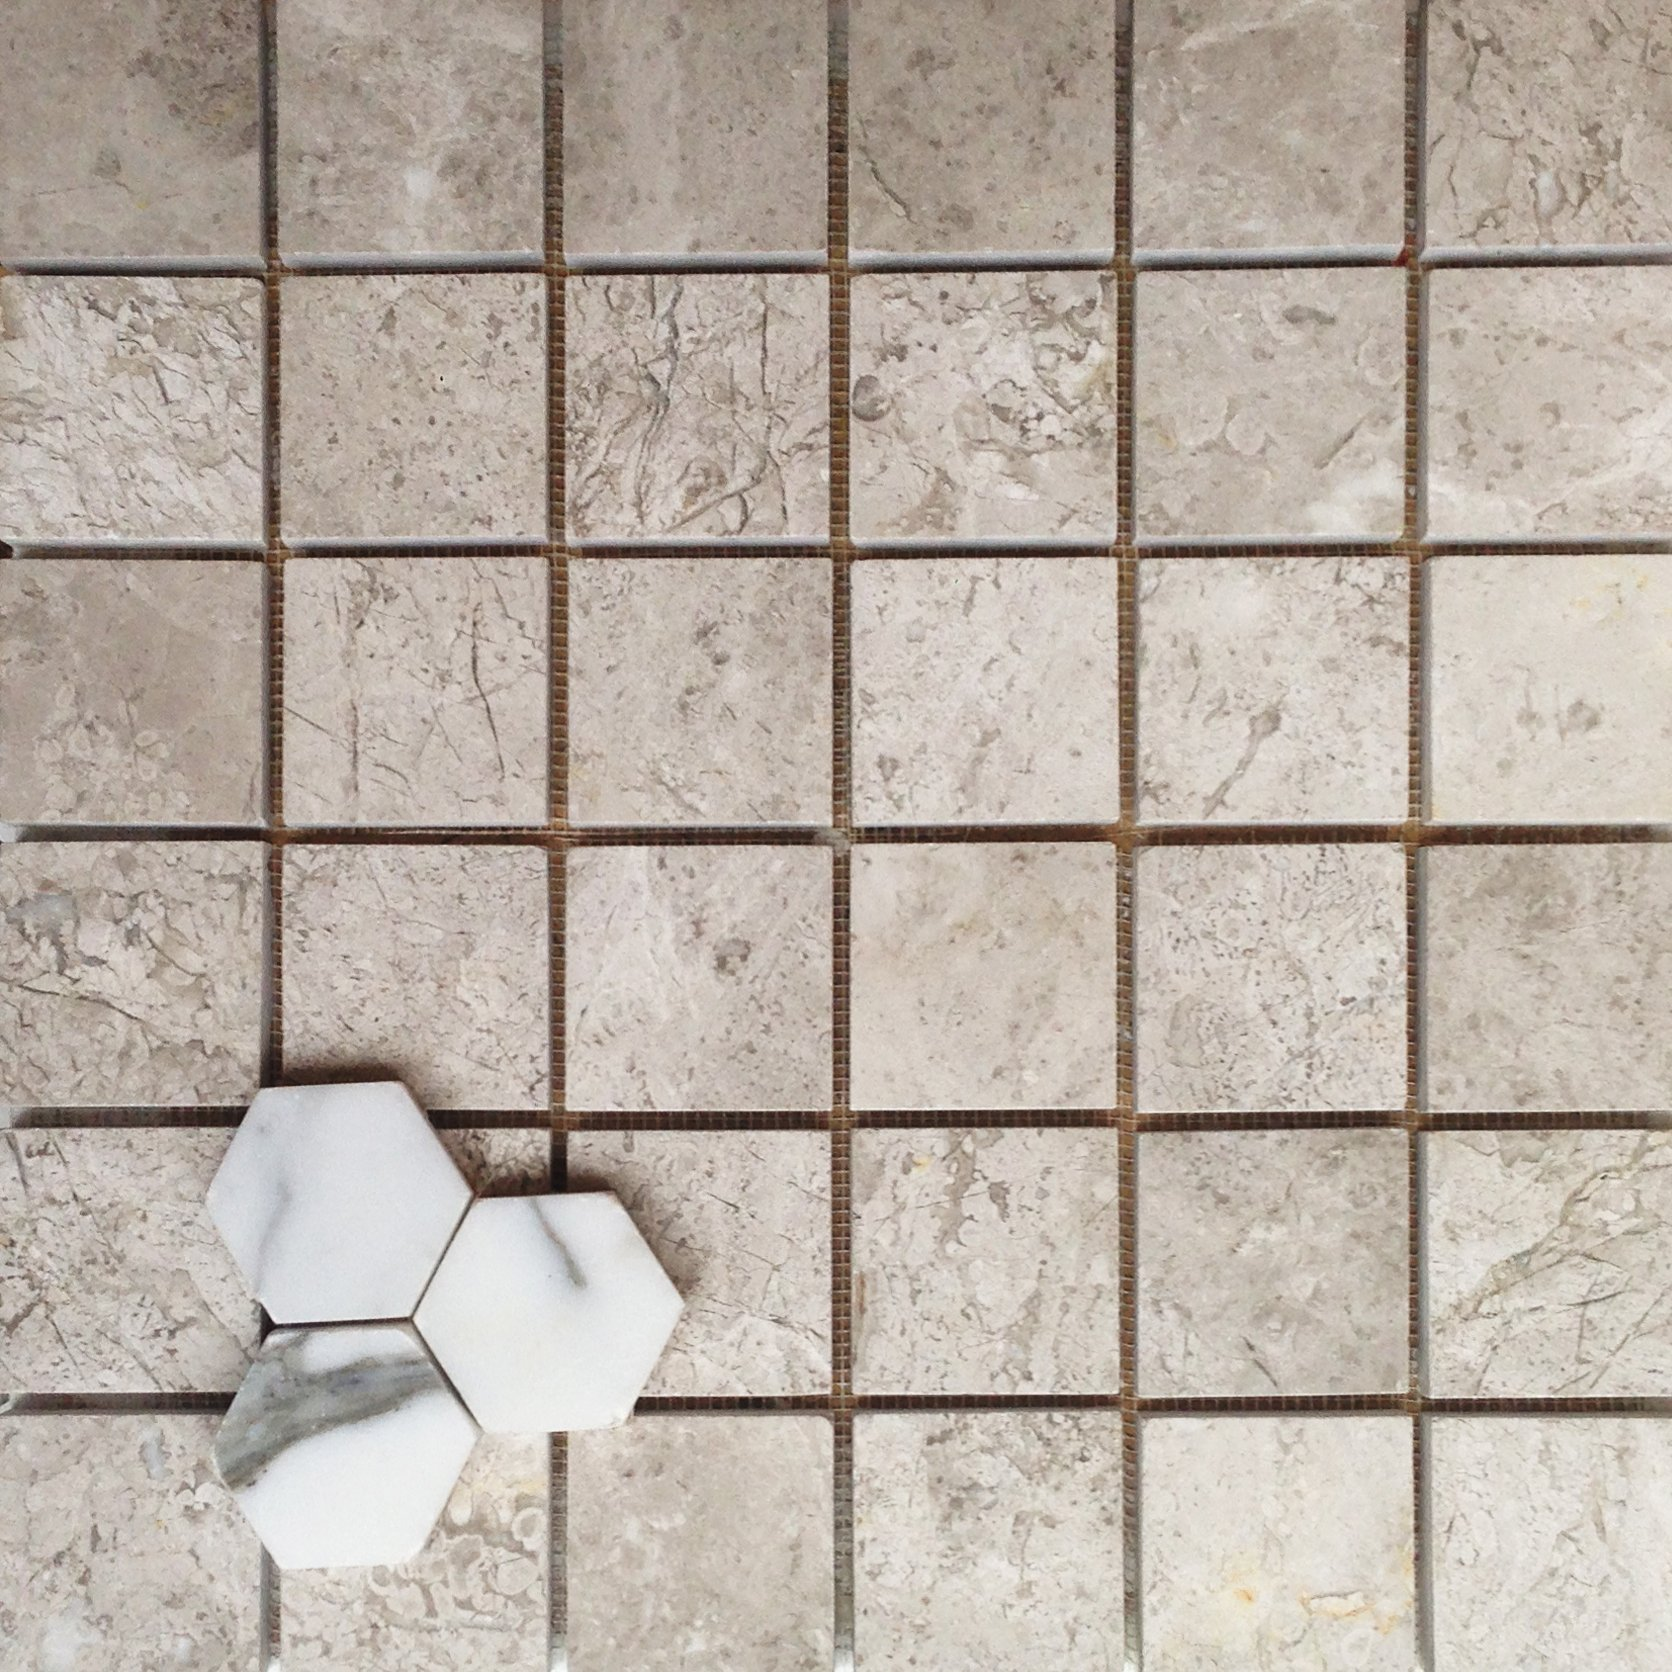 Discount Mosaic Tiles Uk Cheap Mosaic Tiles Bathroom Kitchen Wall Floor Tiles Quartz 1 Beige